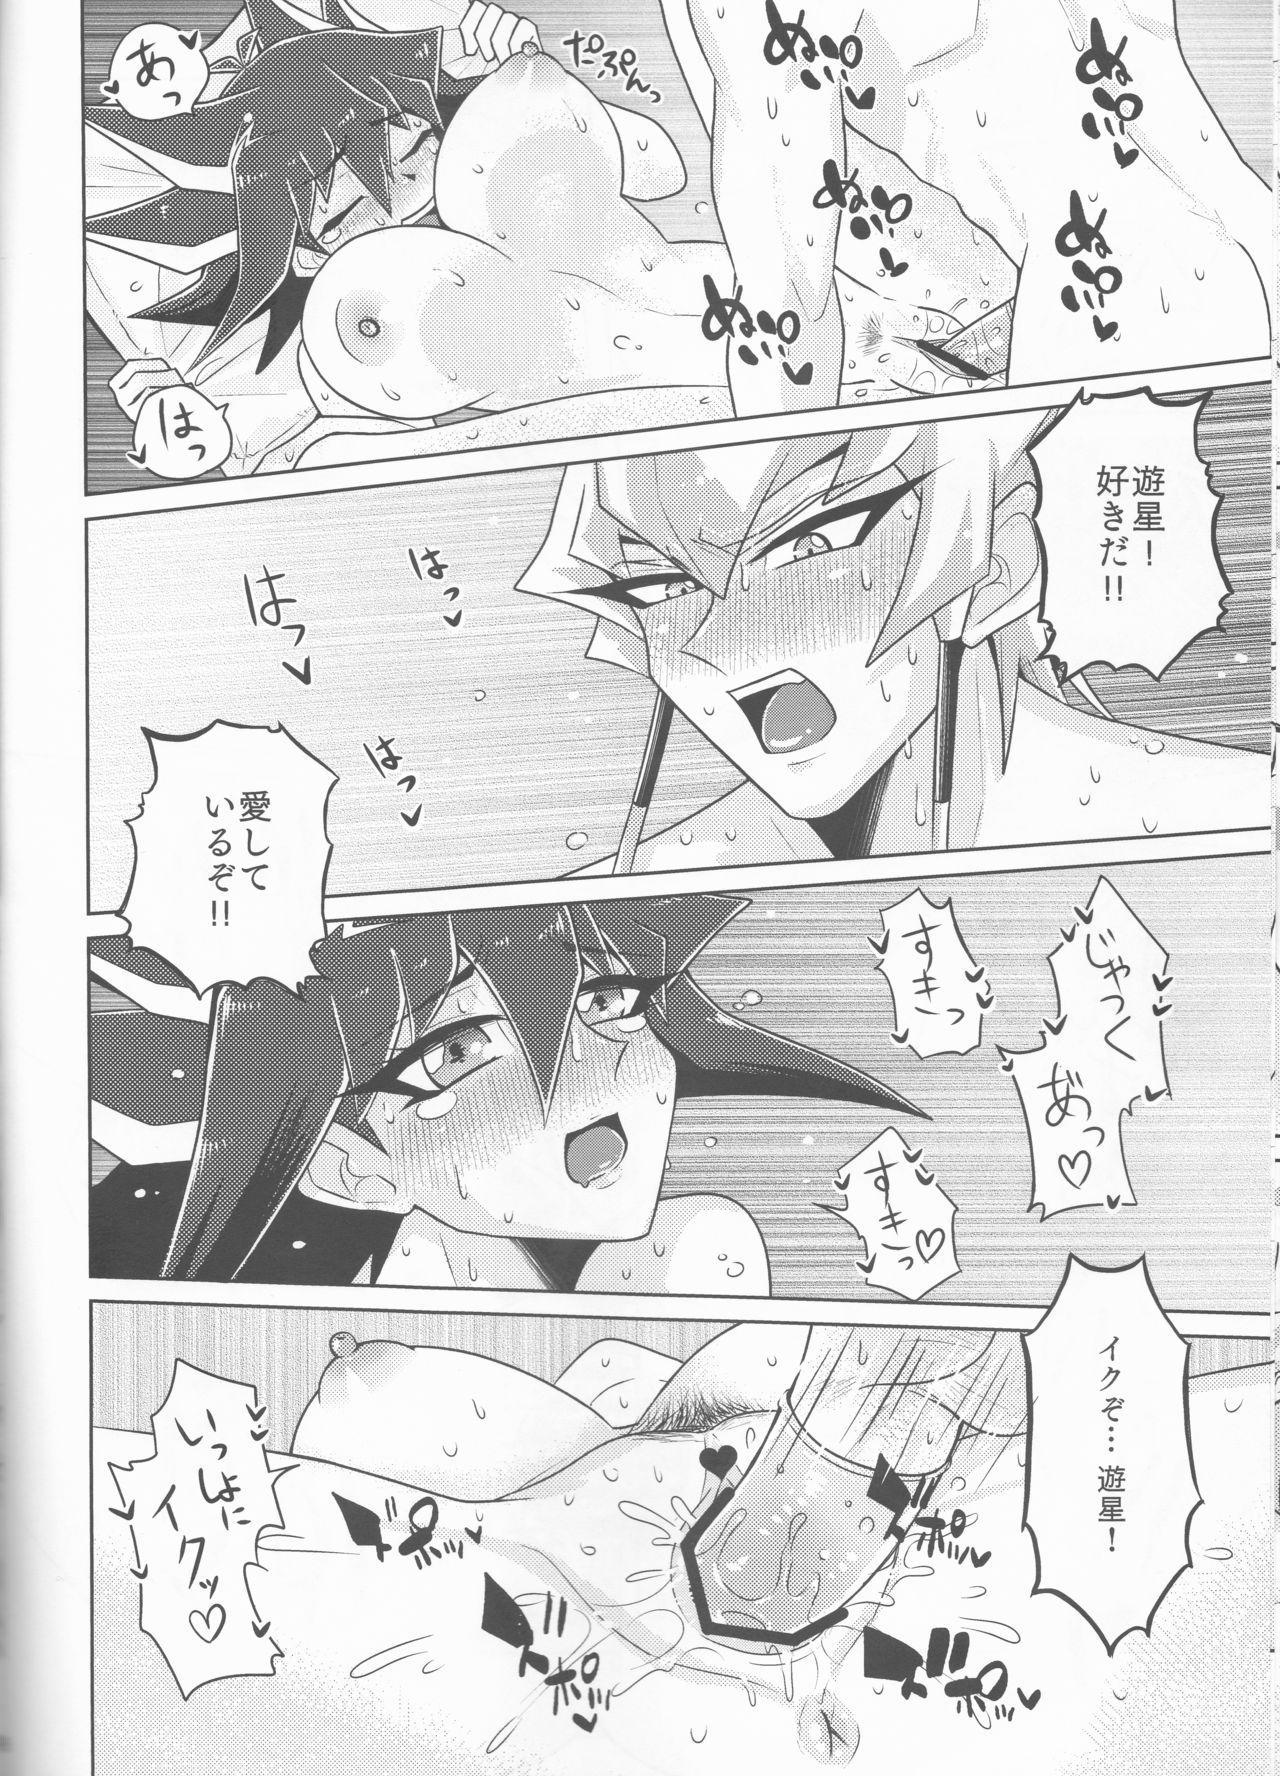 (Chou Ore no Turn 2019) [KINOPOTION (Take Nameko)] King (Mi) to Yusei-chan ♀ (Yu-Gi-Oh! 5D's) 17